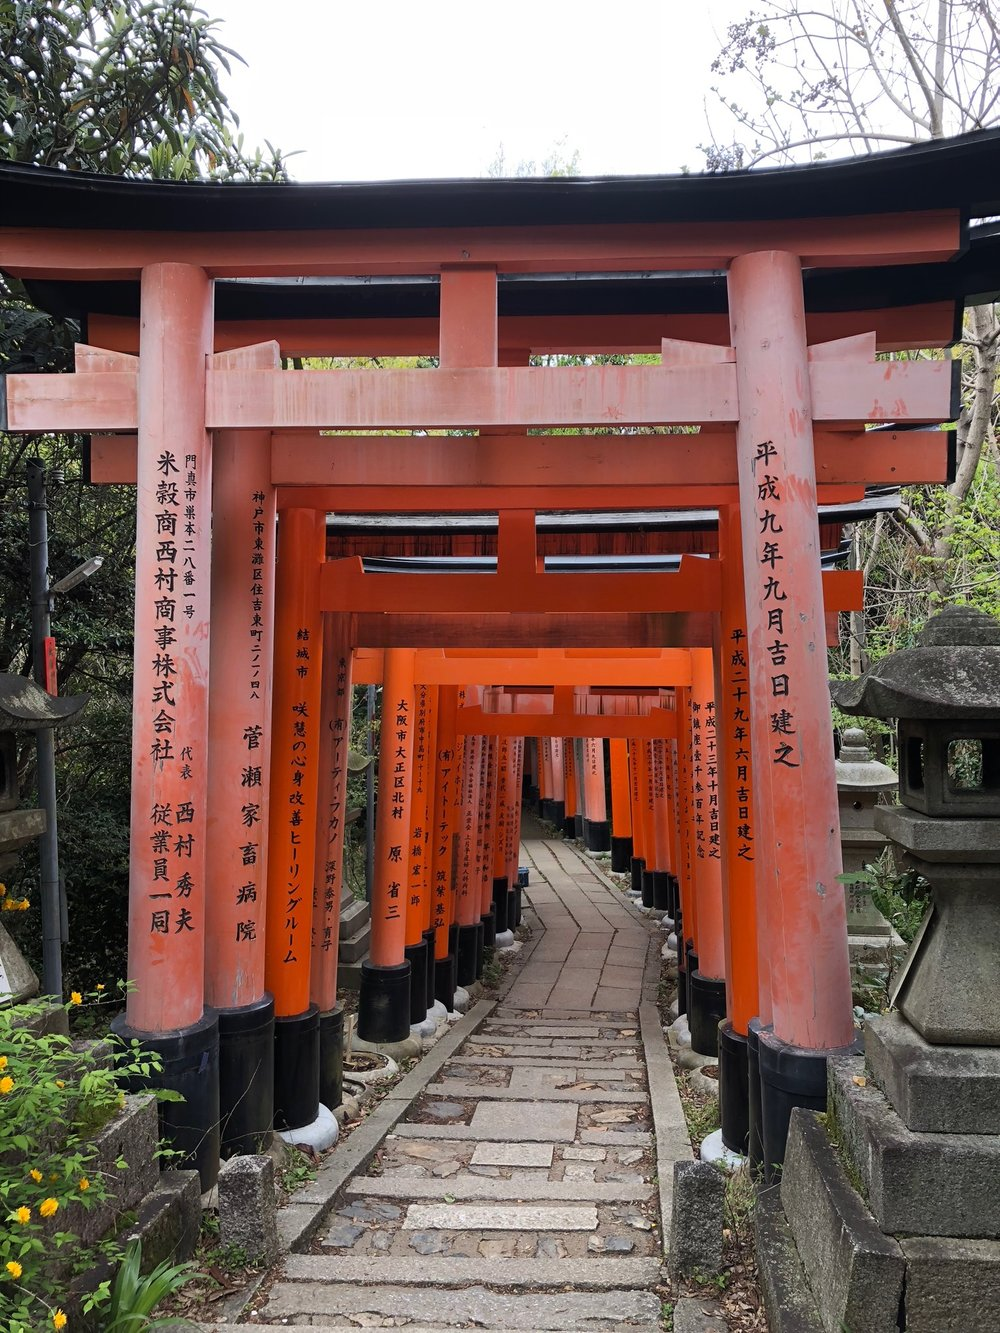 Fushimi Inari-taisha torii gates in Fushimi-ku, Kyoto